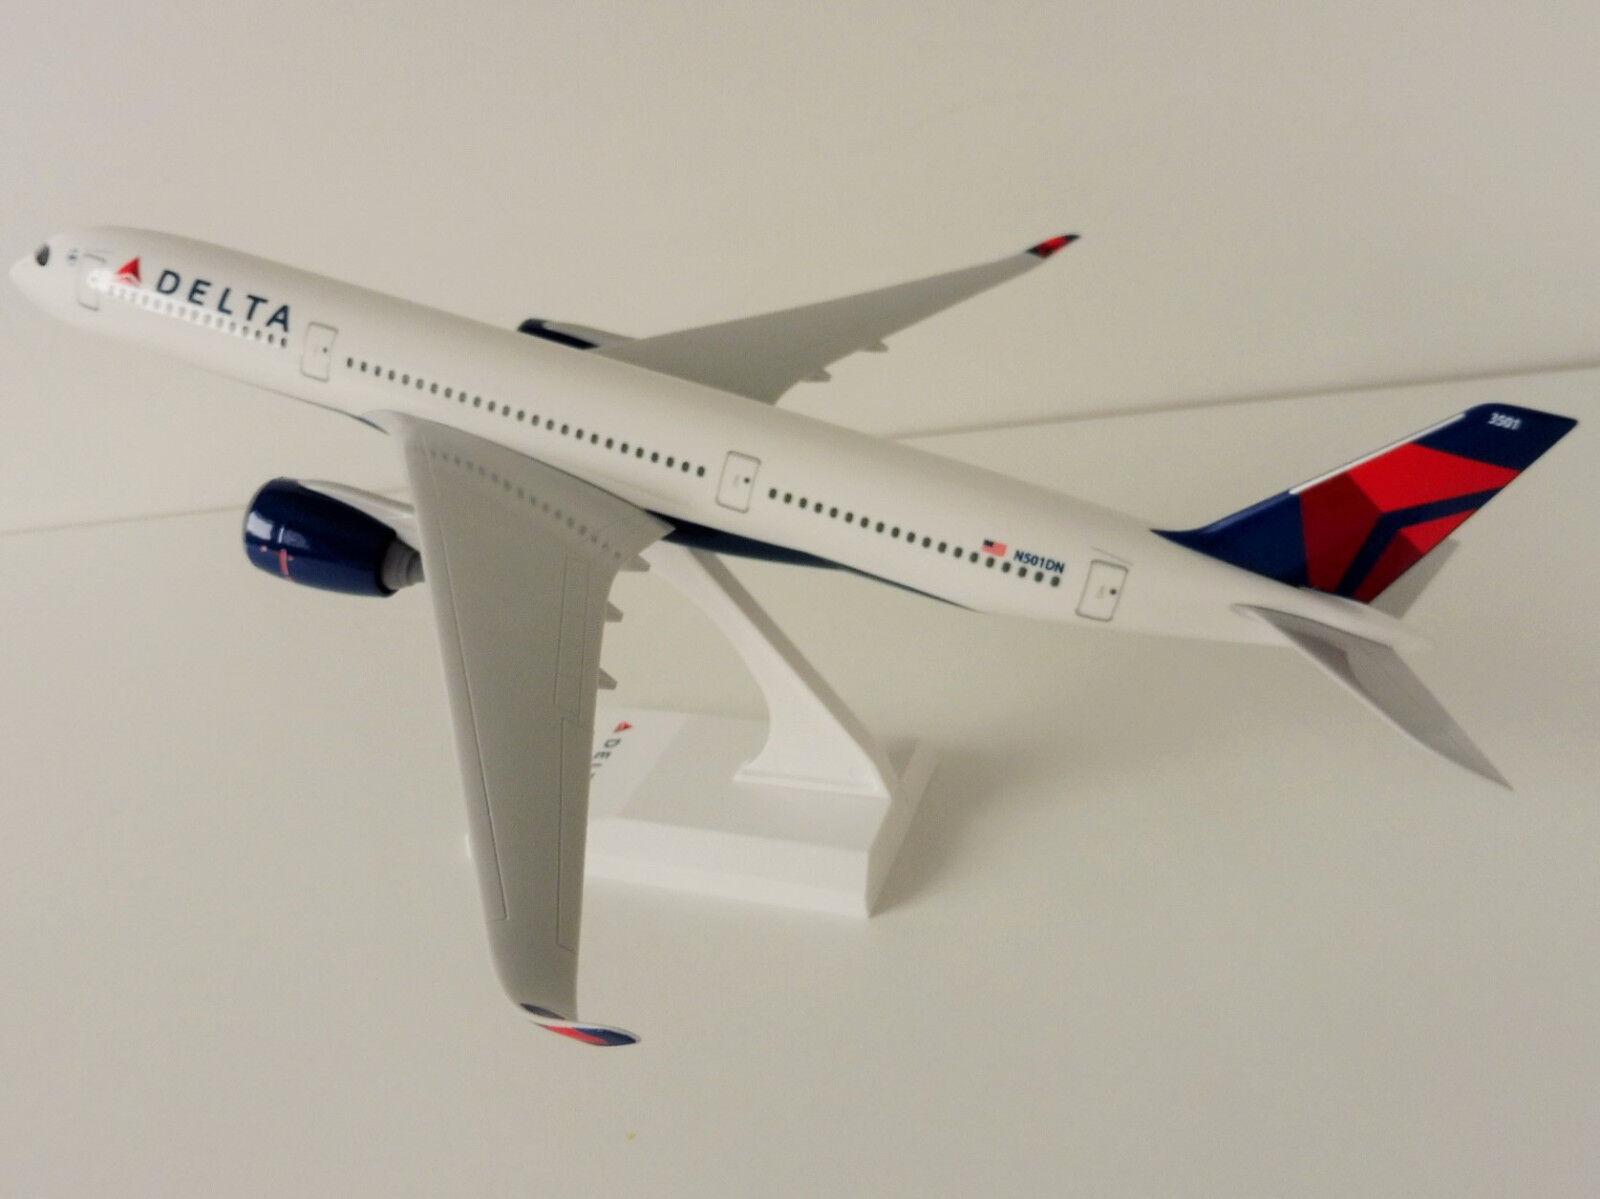 Airbus A350-900 Delta 1/200 Skr950 Skymarks Airlines A350a 350 Xwb